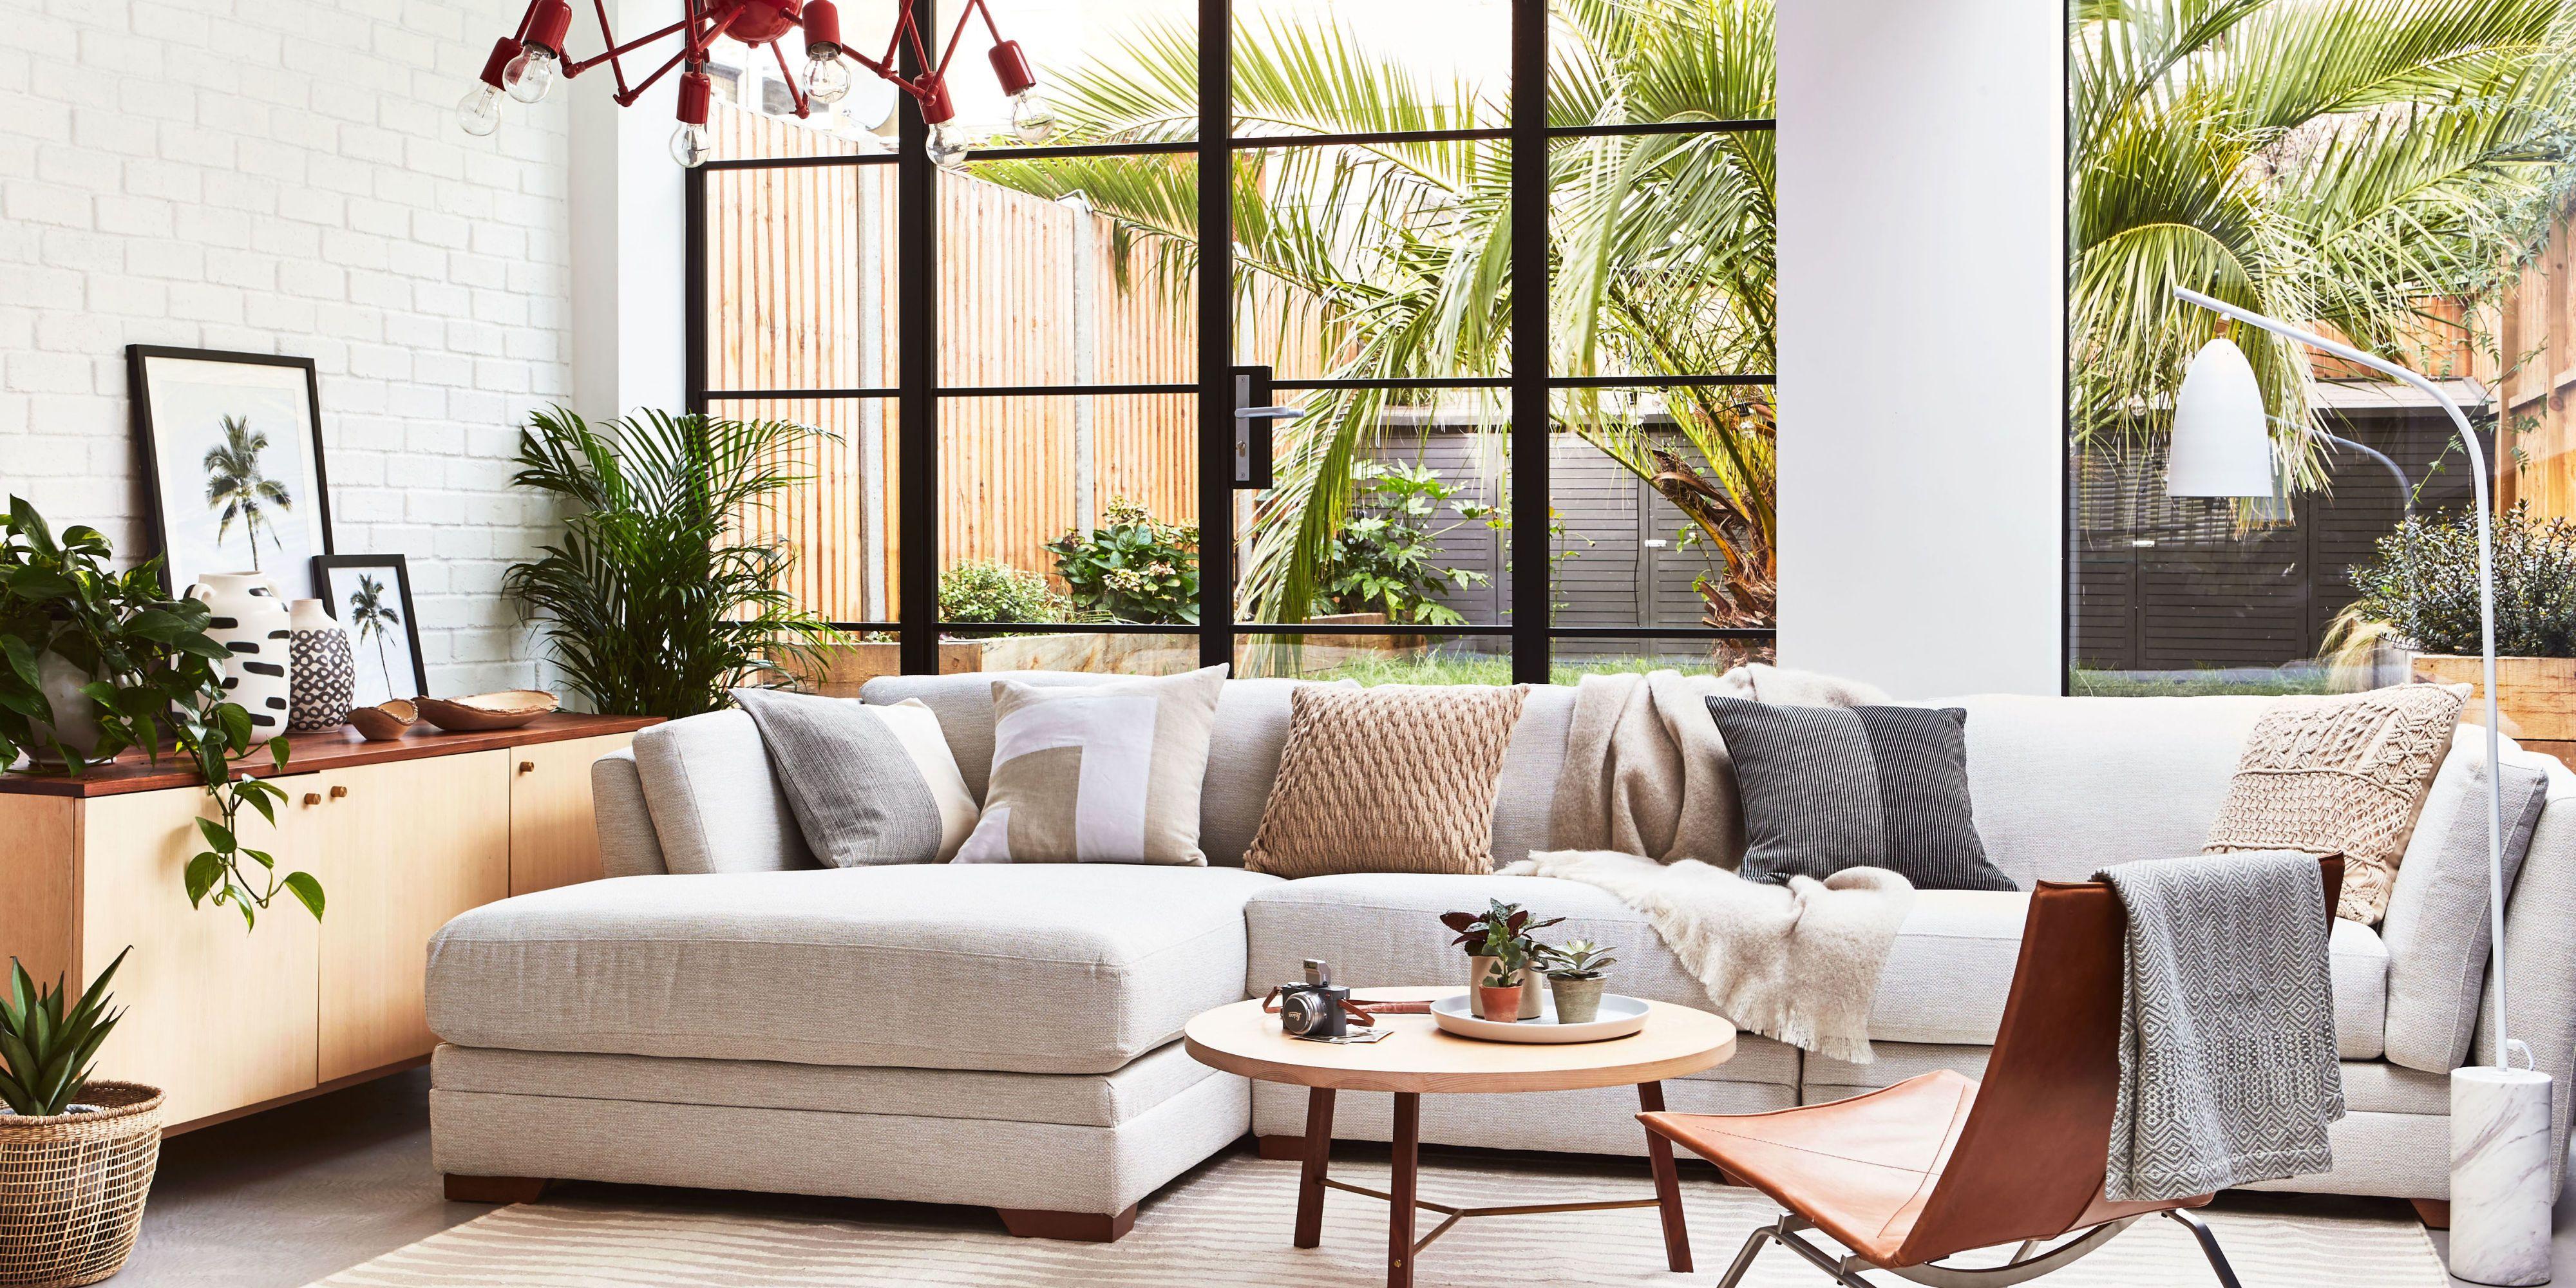 Modular Long Beach Sofa   House Beautiful Collection At DFS